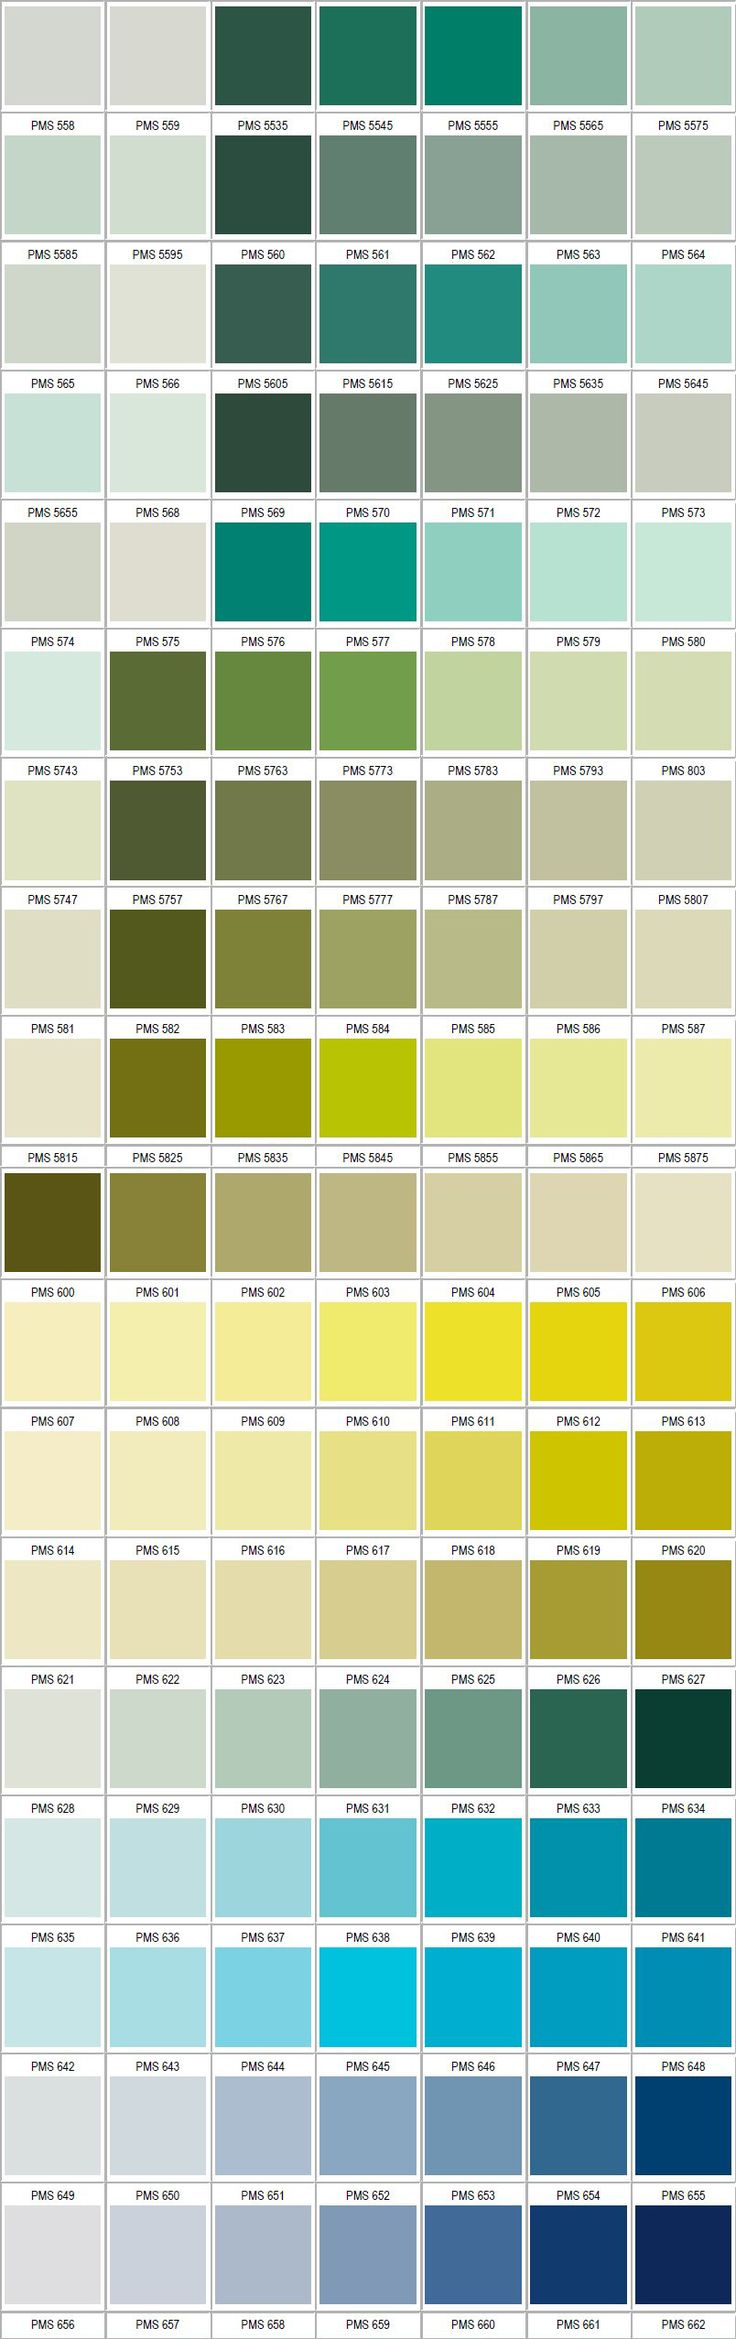 verde limón, verde esmeralda, verde menta, verde amarillo jajajajj